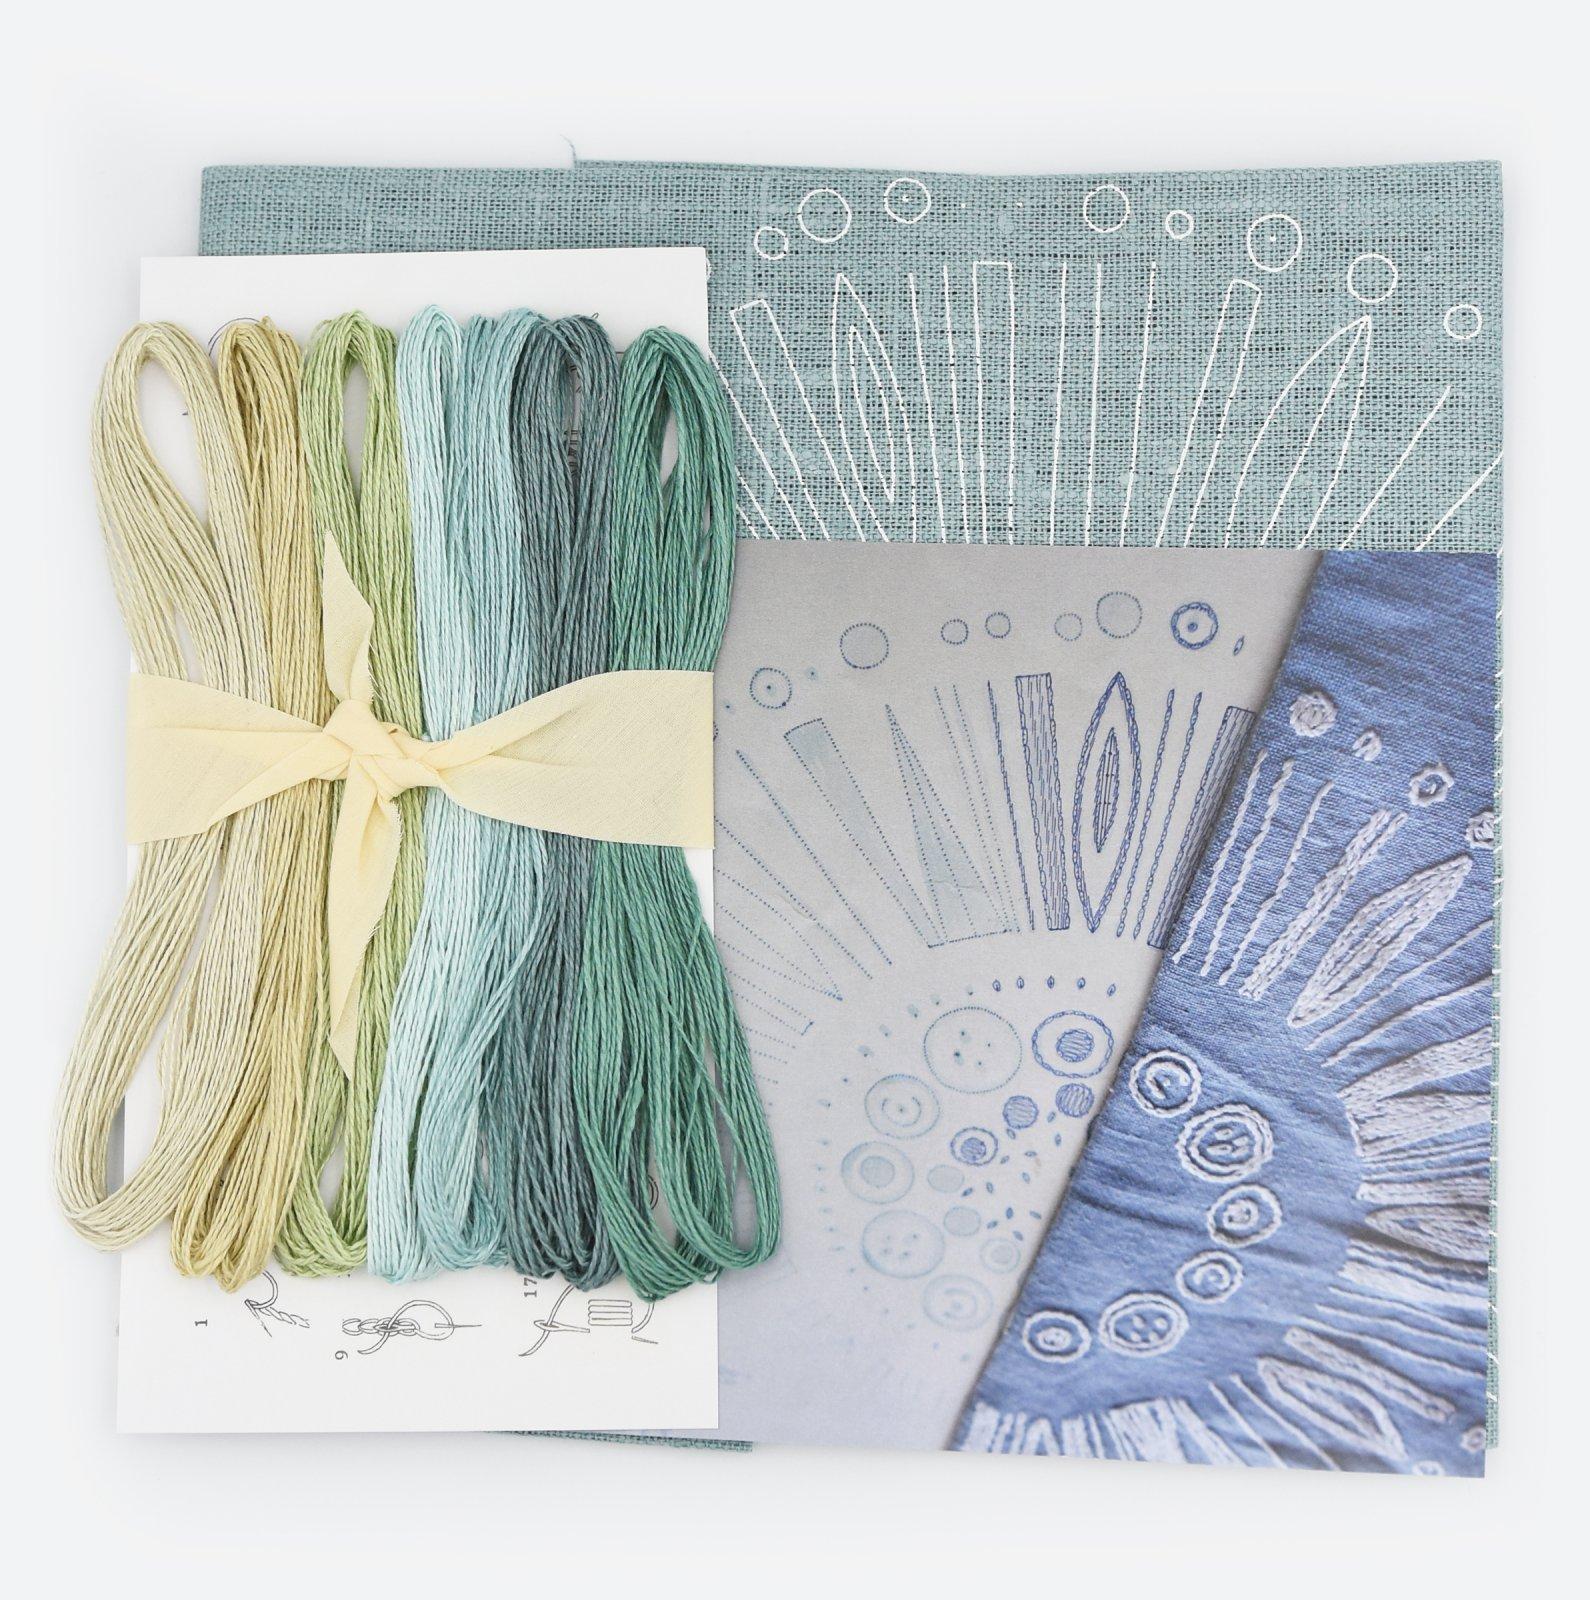 Linladan - Duck Egg Blue Circle - Nordiska print with linen threads